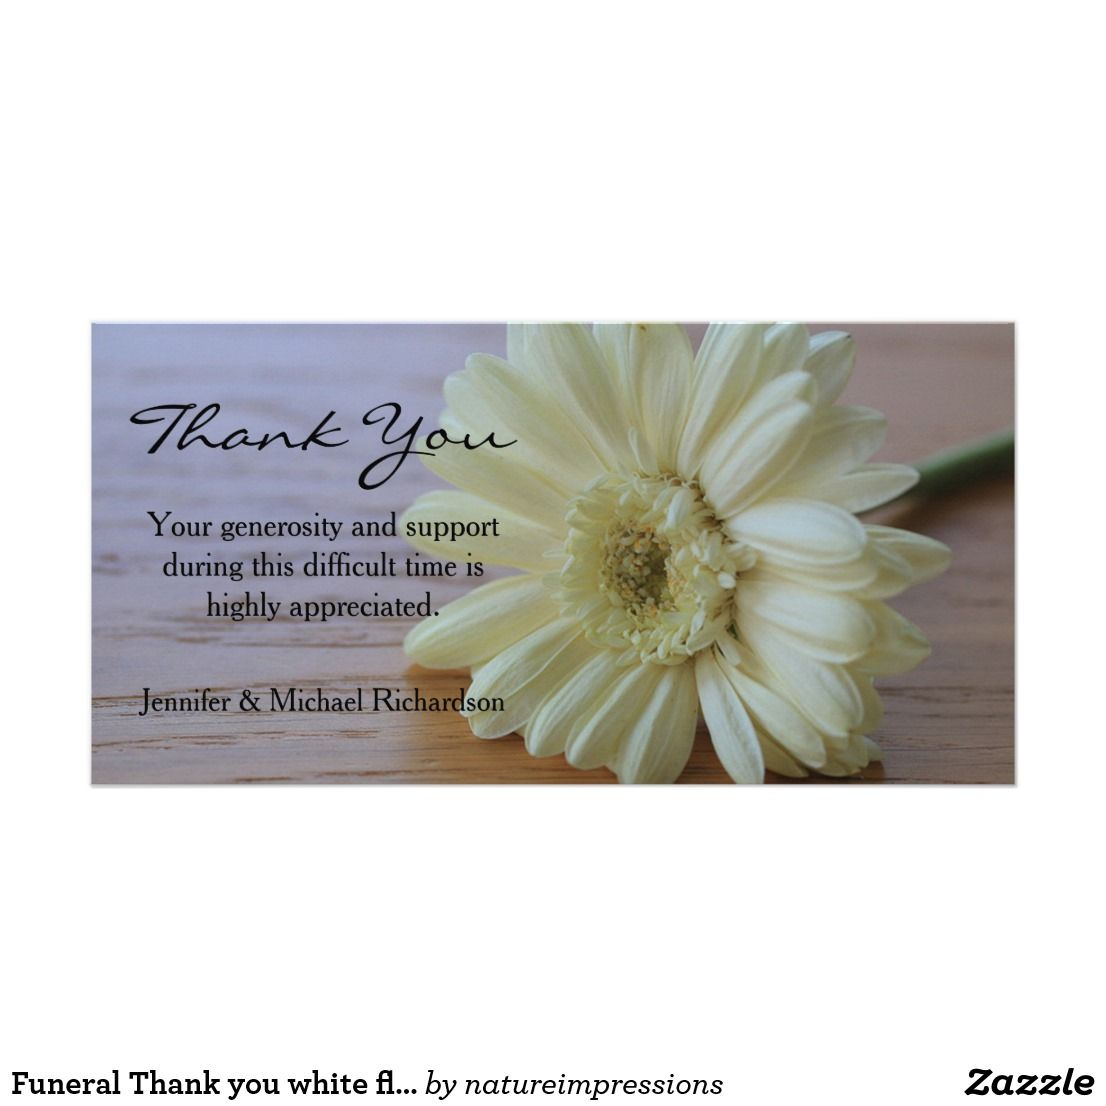 17 Heartfelt Sympathy Thank You Messages Resume Samples